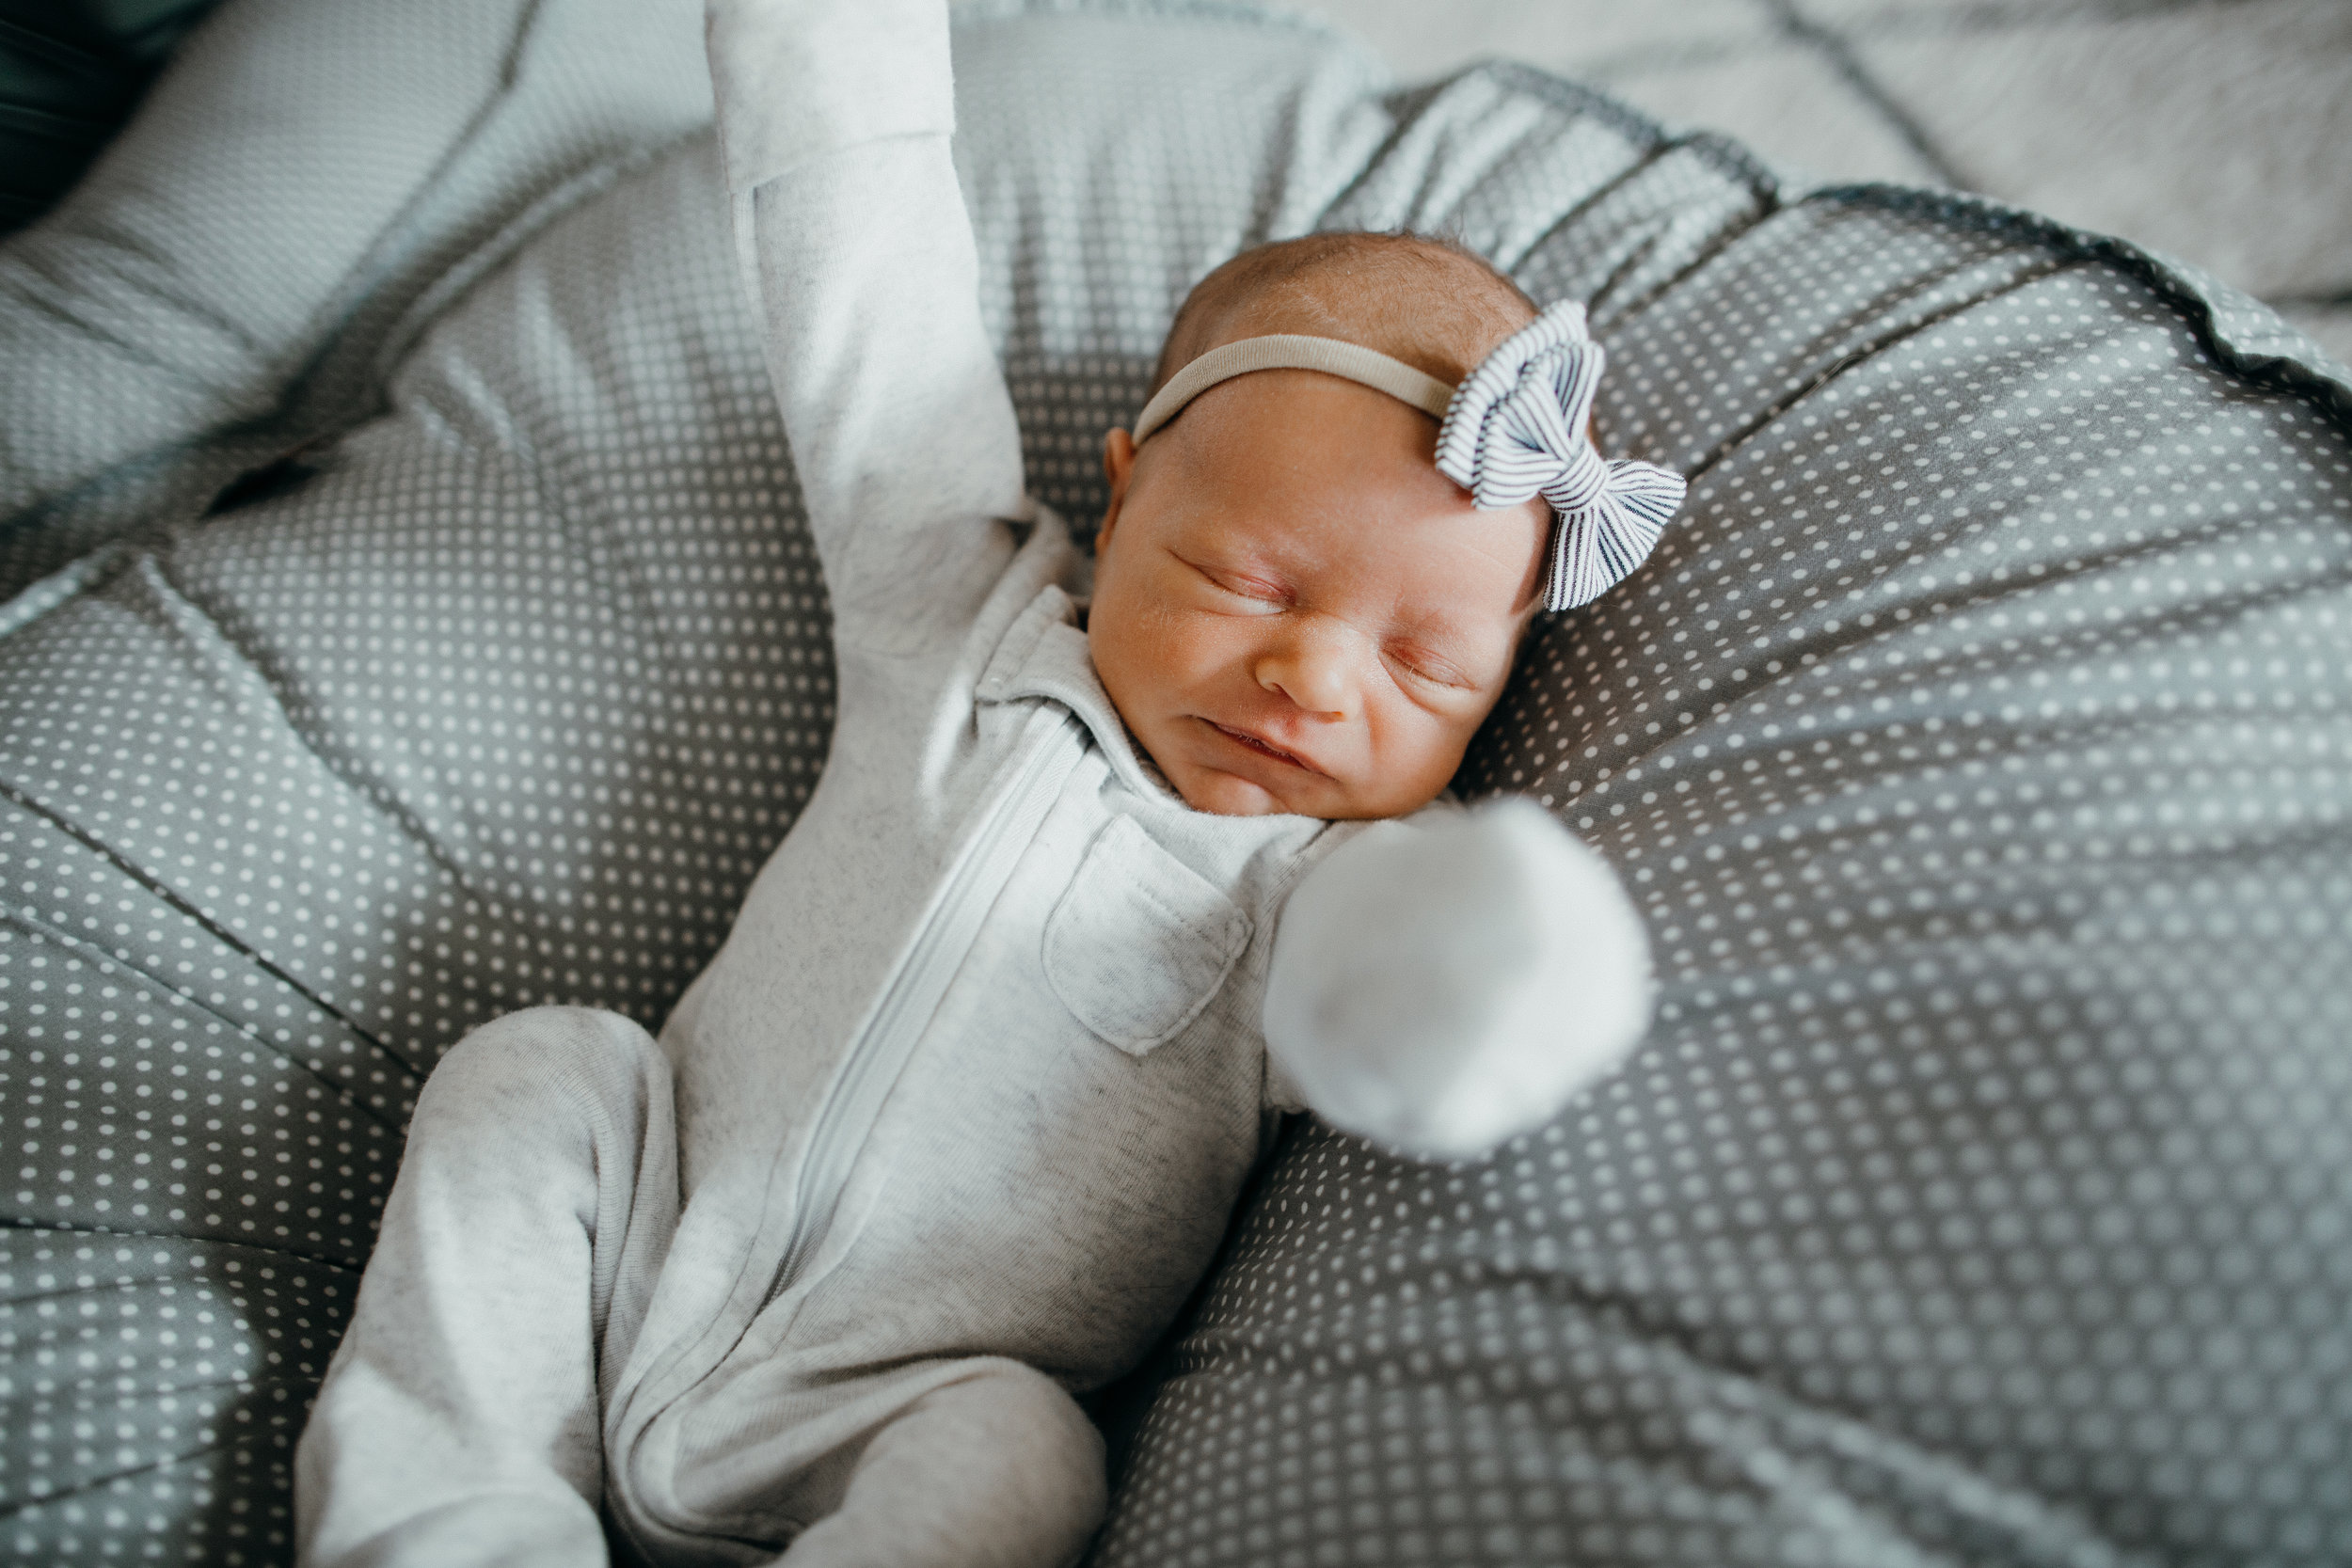 jamieleighmiller_inhome_newborn_photographer_omahanebraska-1.jpg